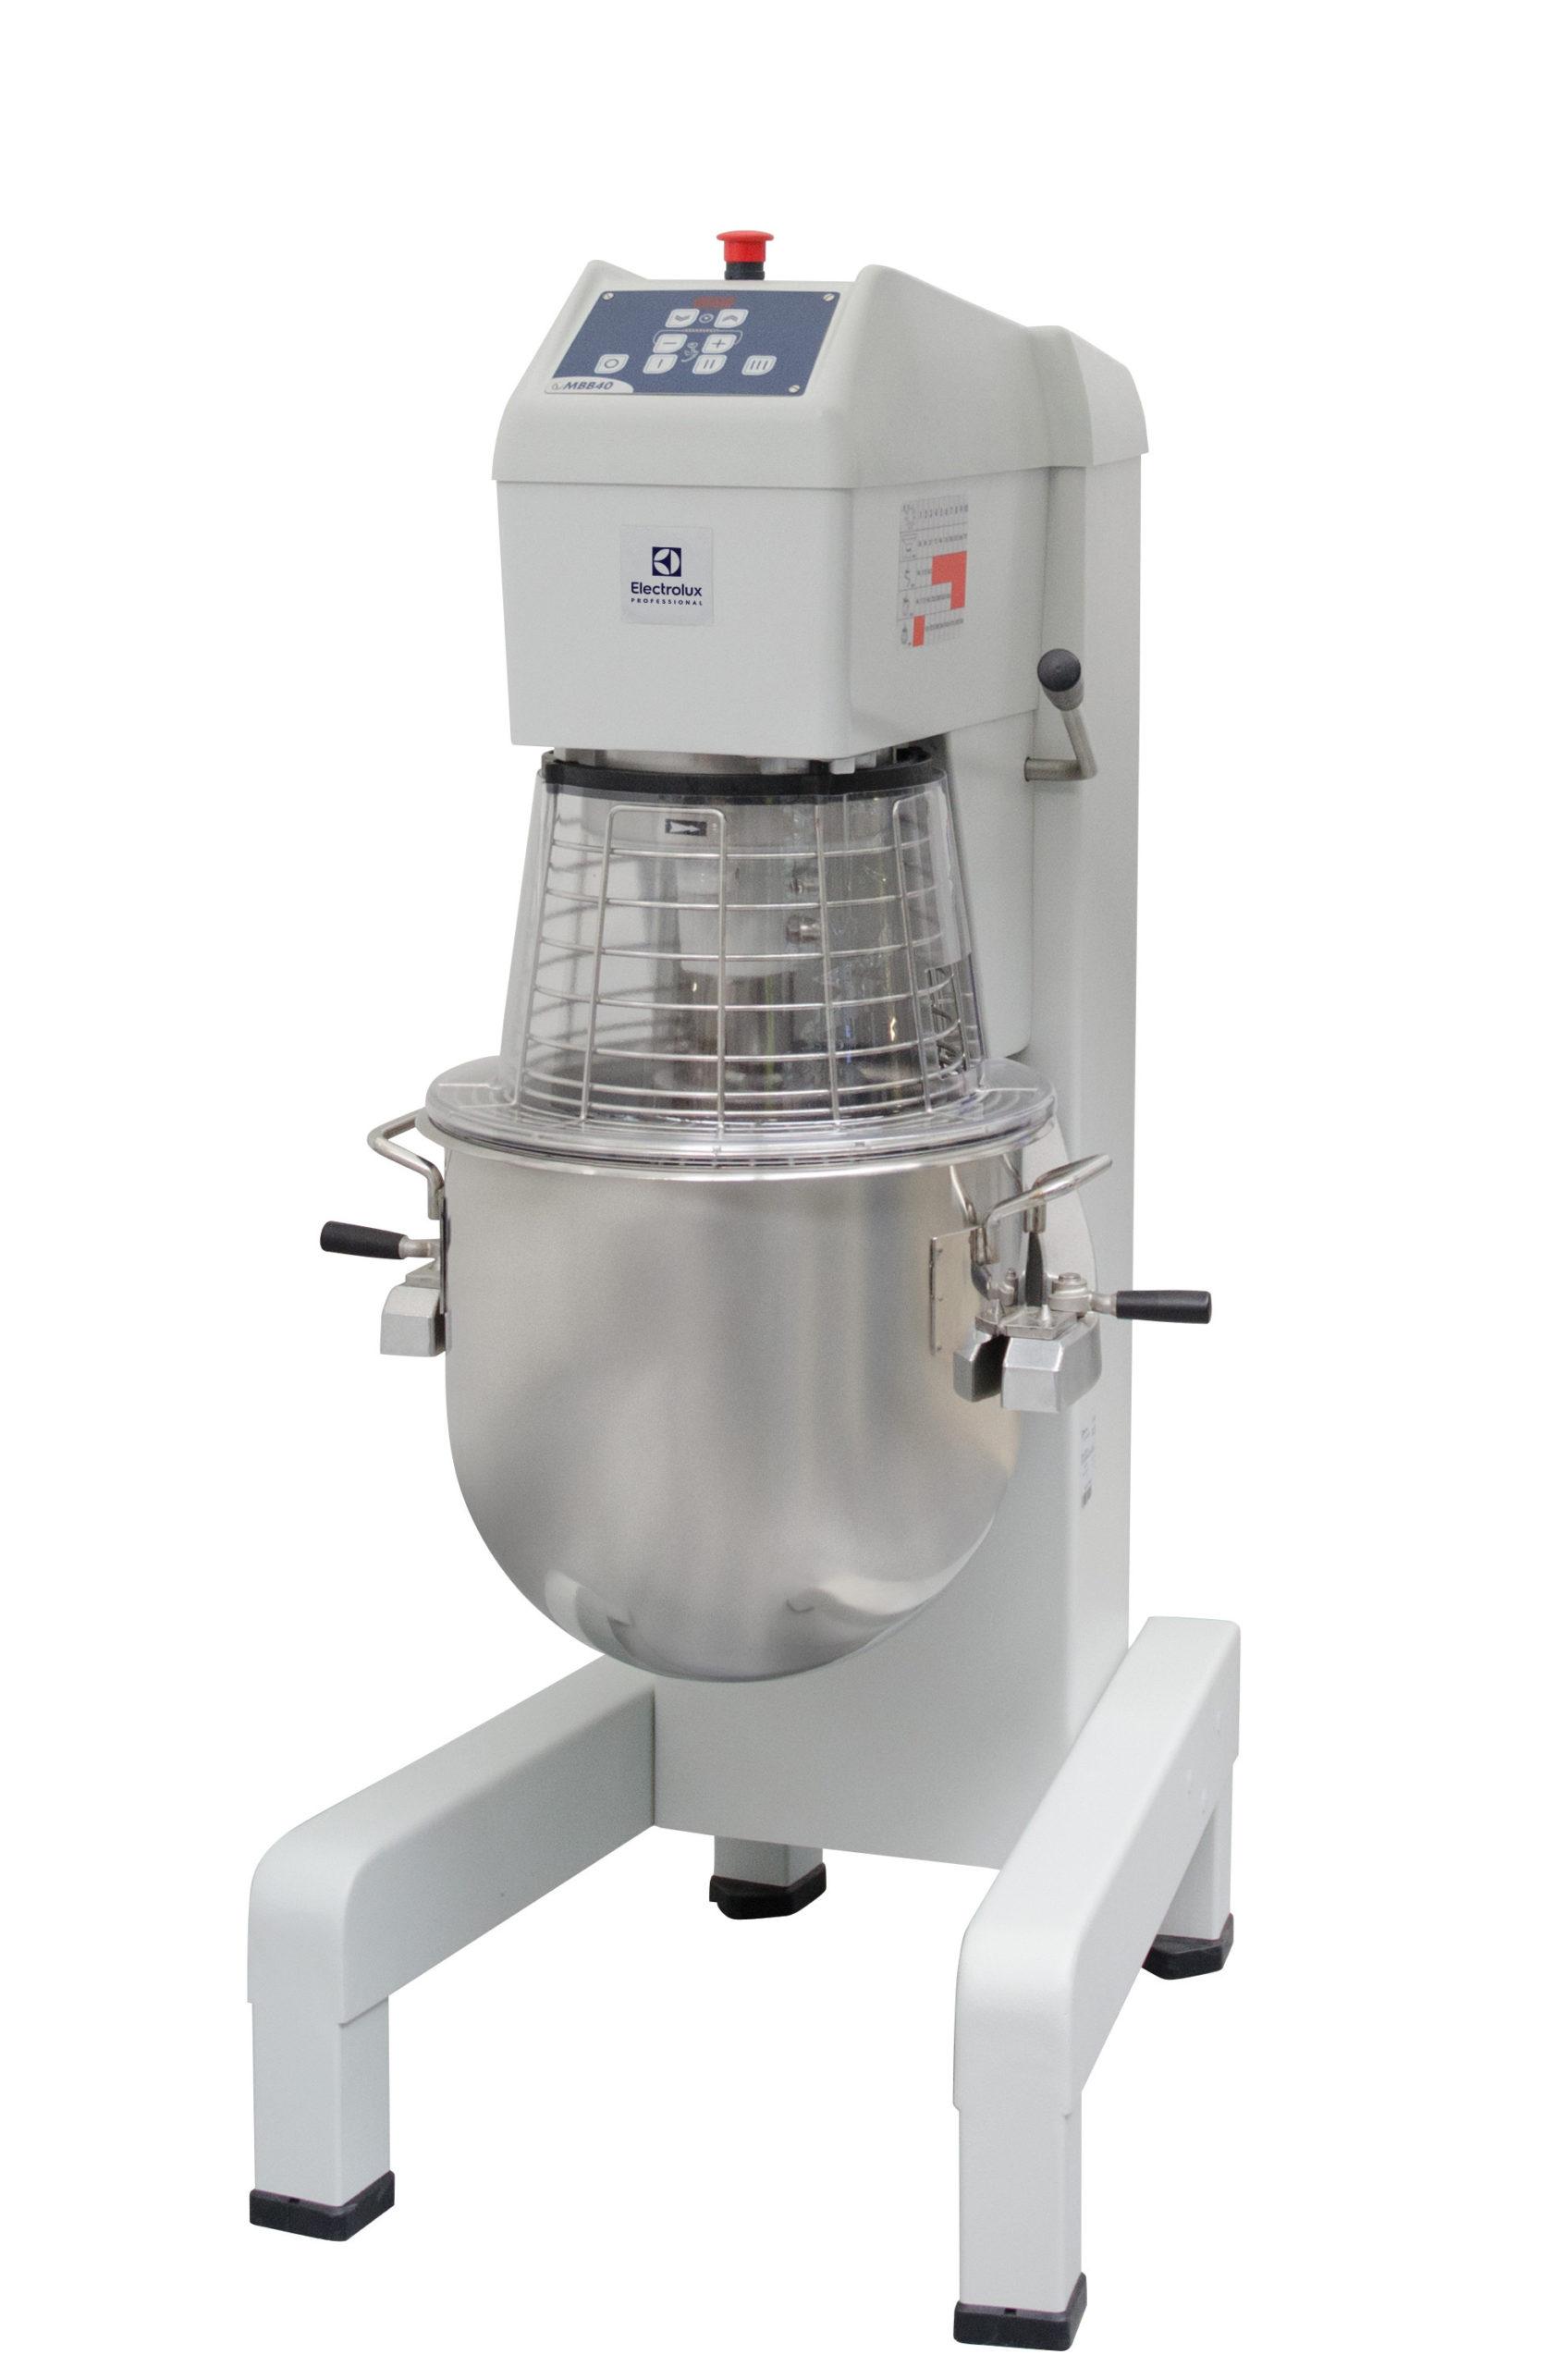 Electrolux MBE40 – 40 liters røremaskine